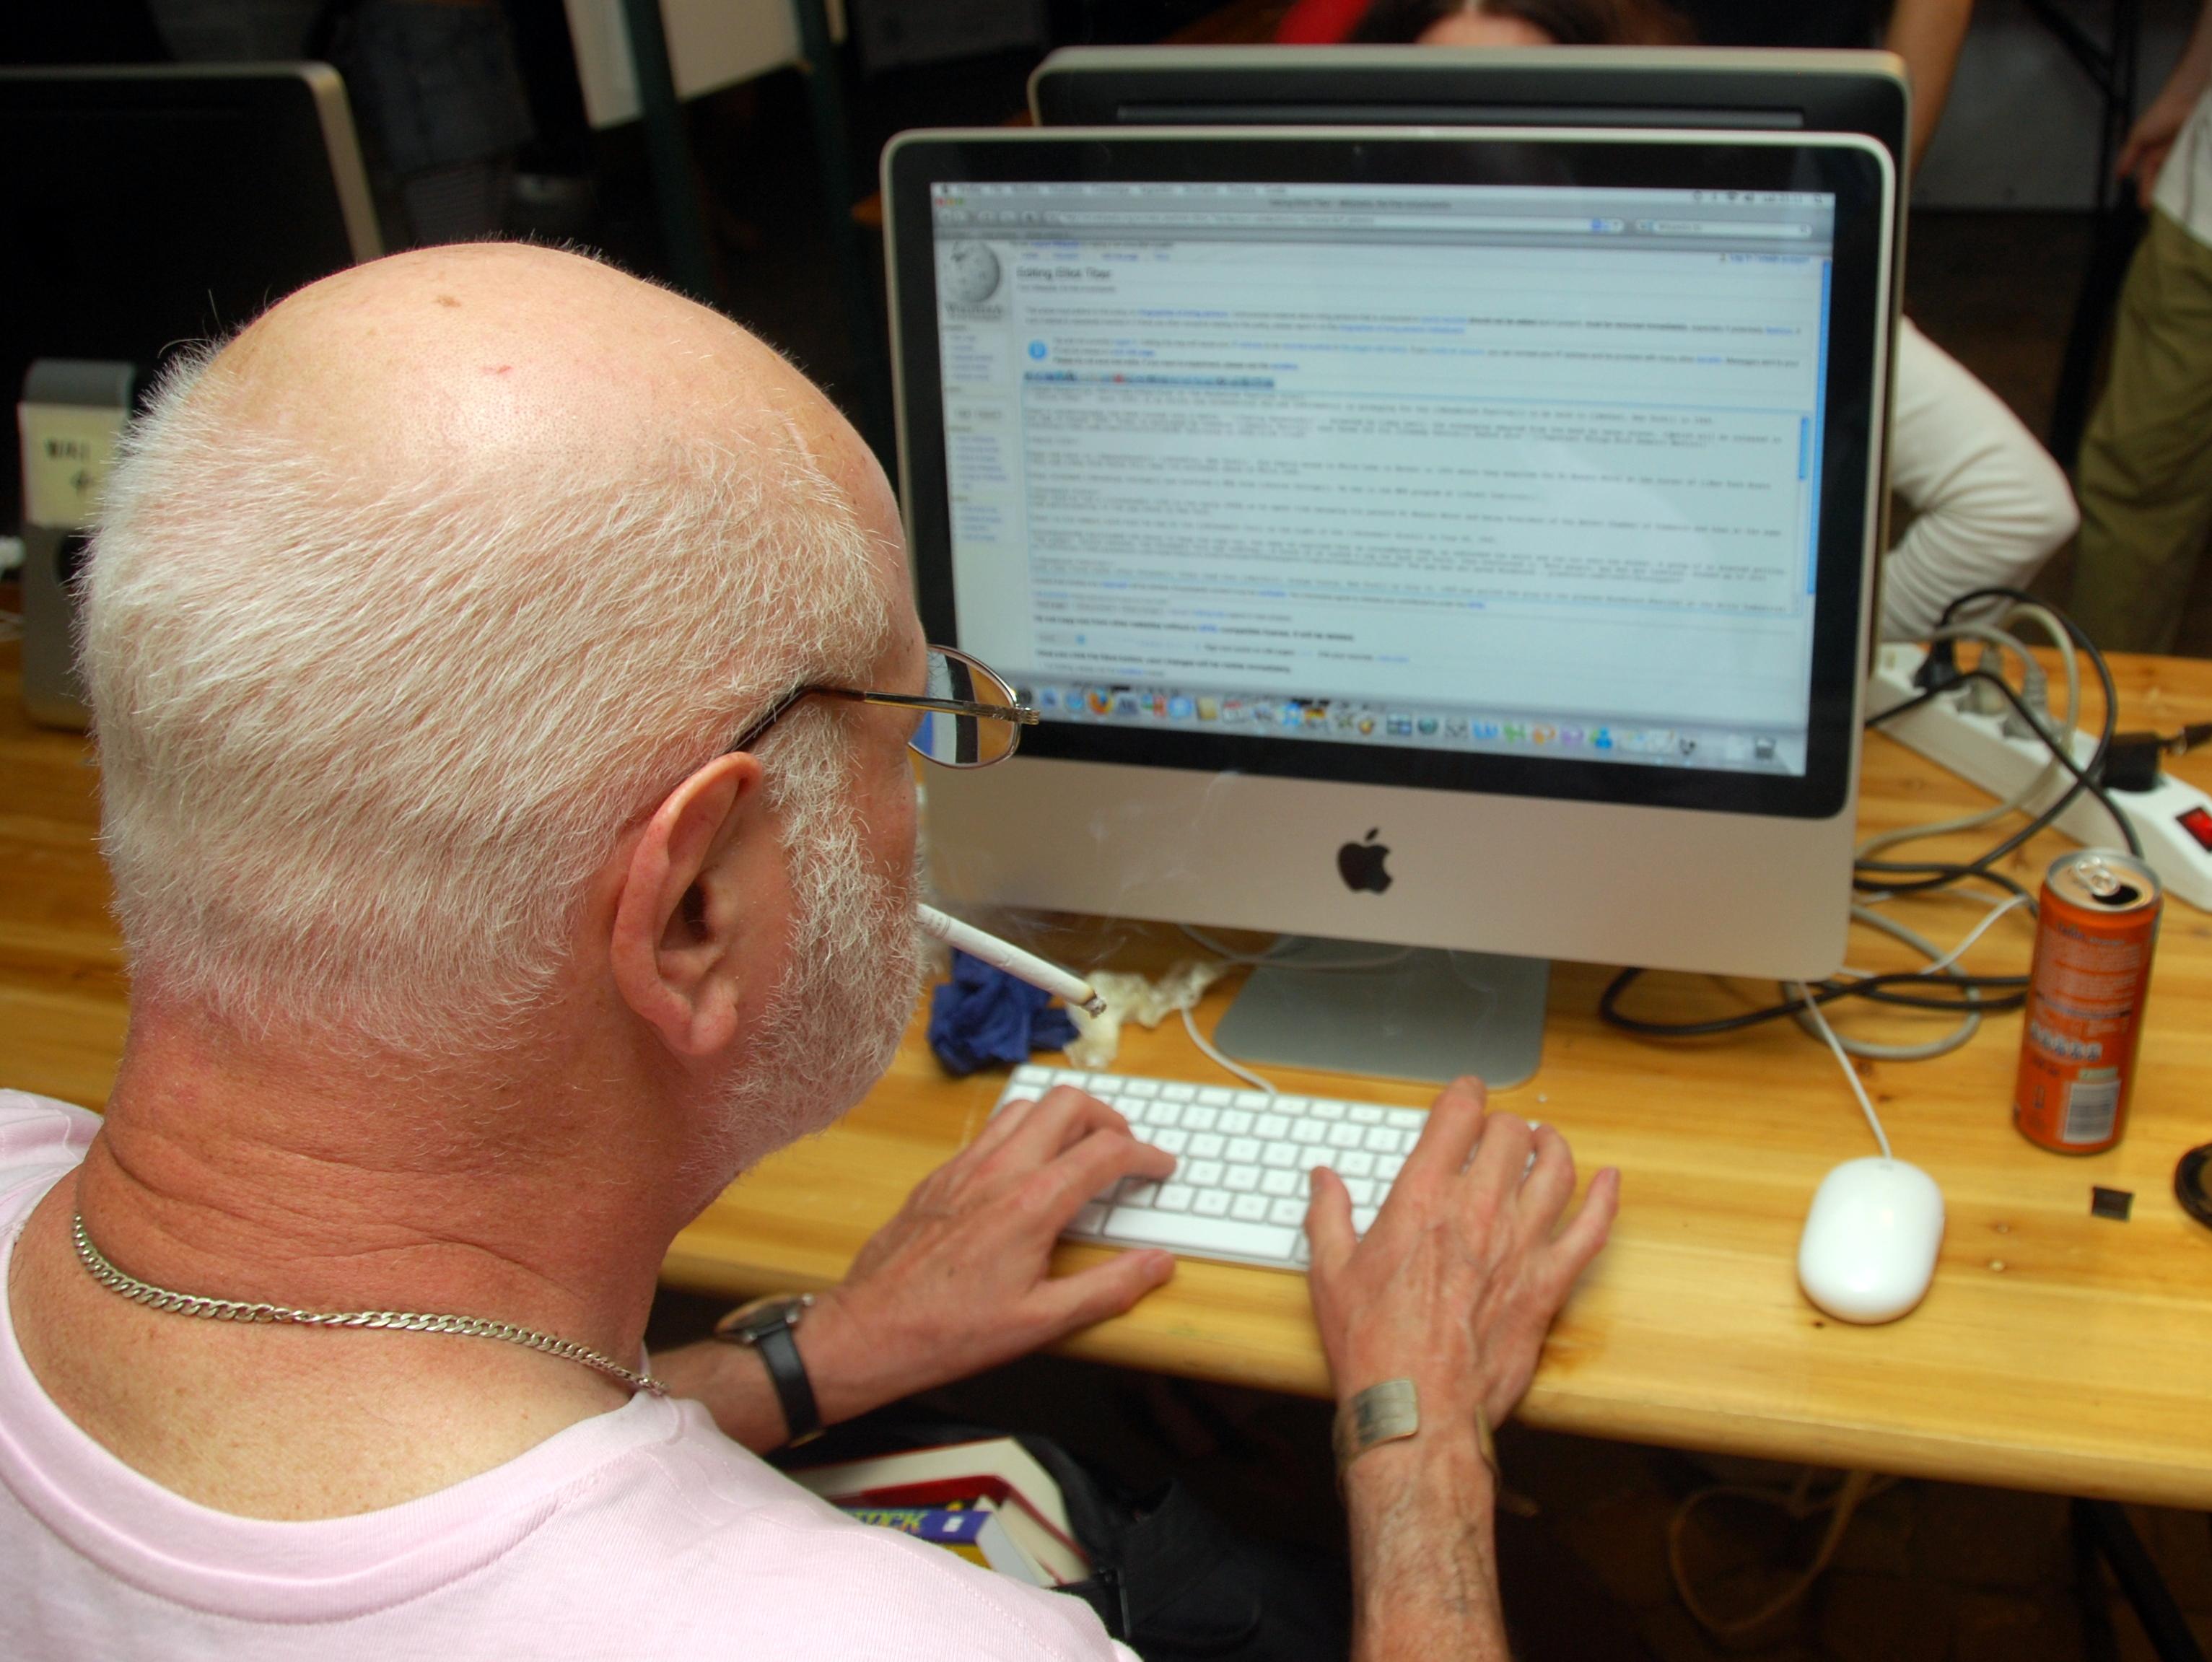 Fileelliot Tiber Editing Wikipediajpg Wikimedia Commons